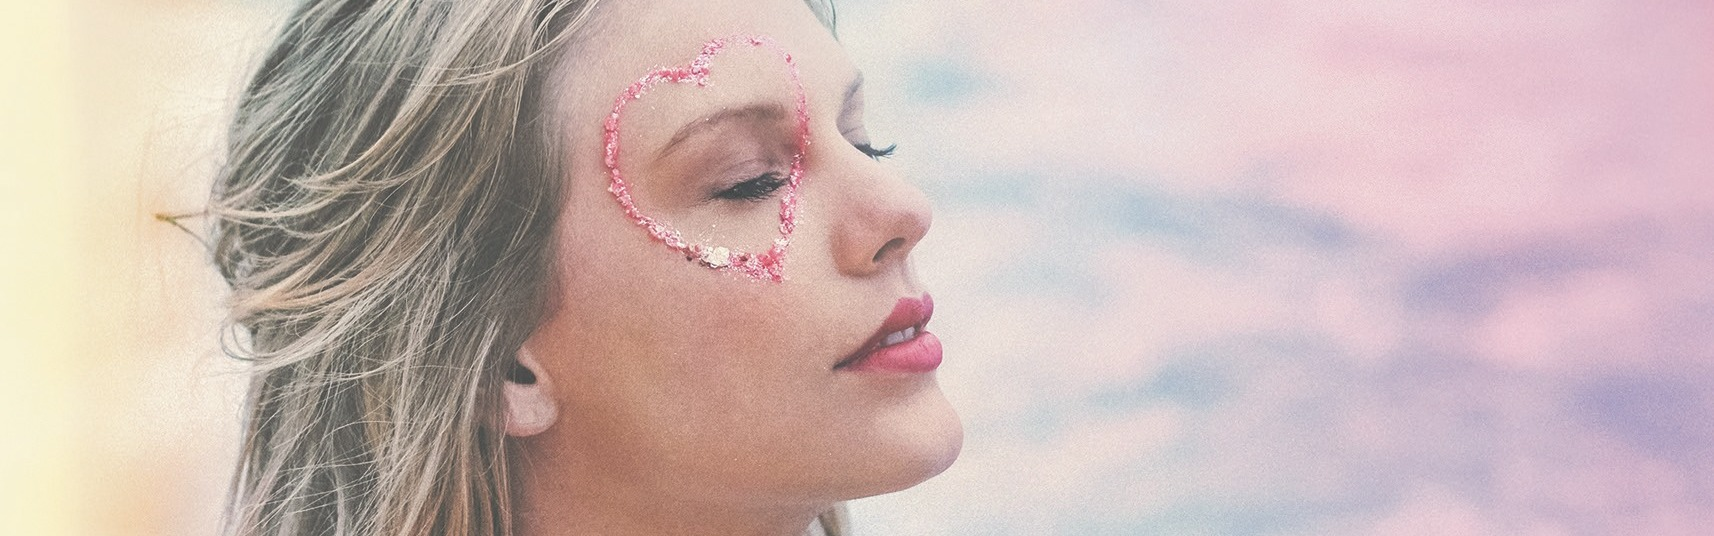 The Songs - Taylor Swift Switzerland